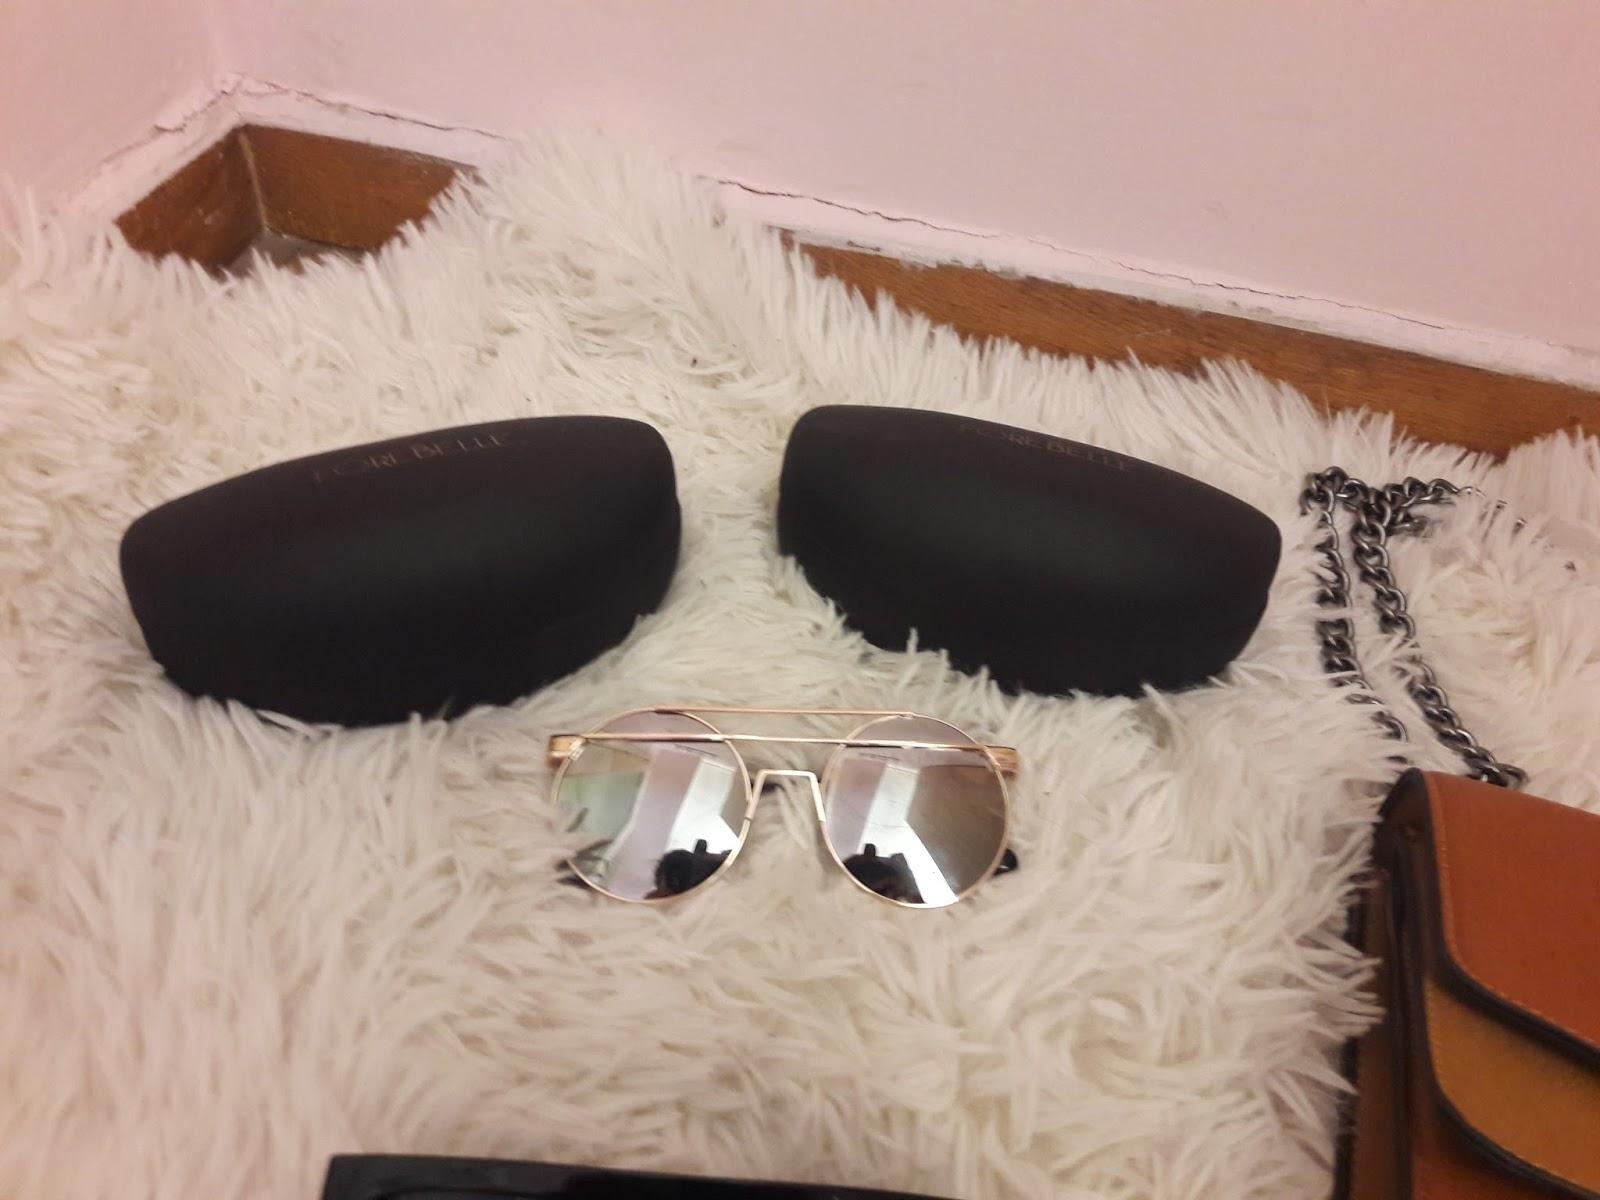 e75f0e8d80 γυαλιά ηλίου γύρω στα 12 ευρώ το καθένα.Η ποιότητα τους είναι άψογη.